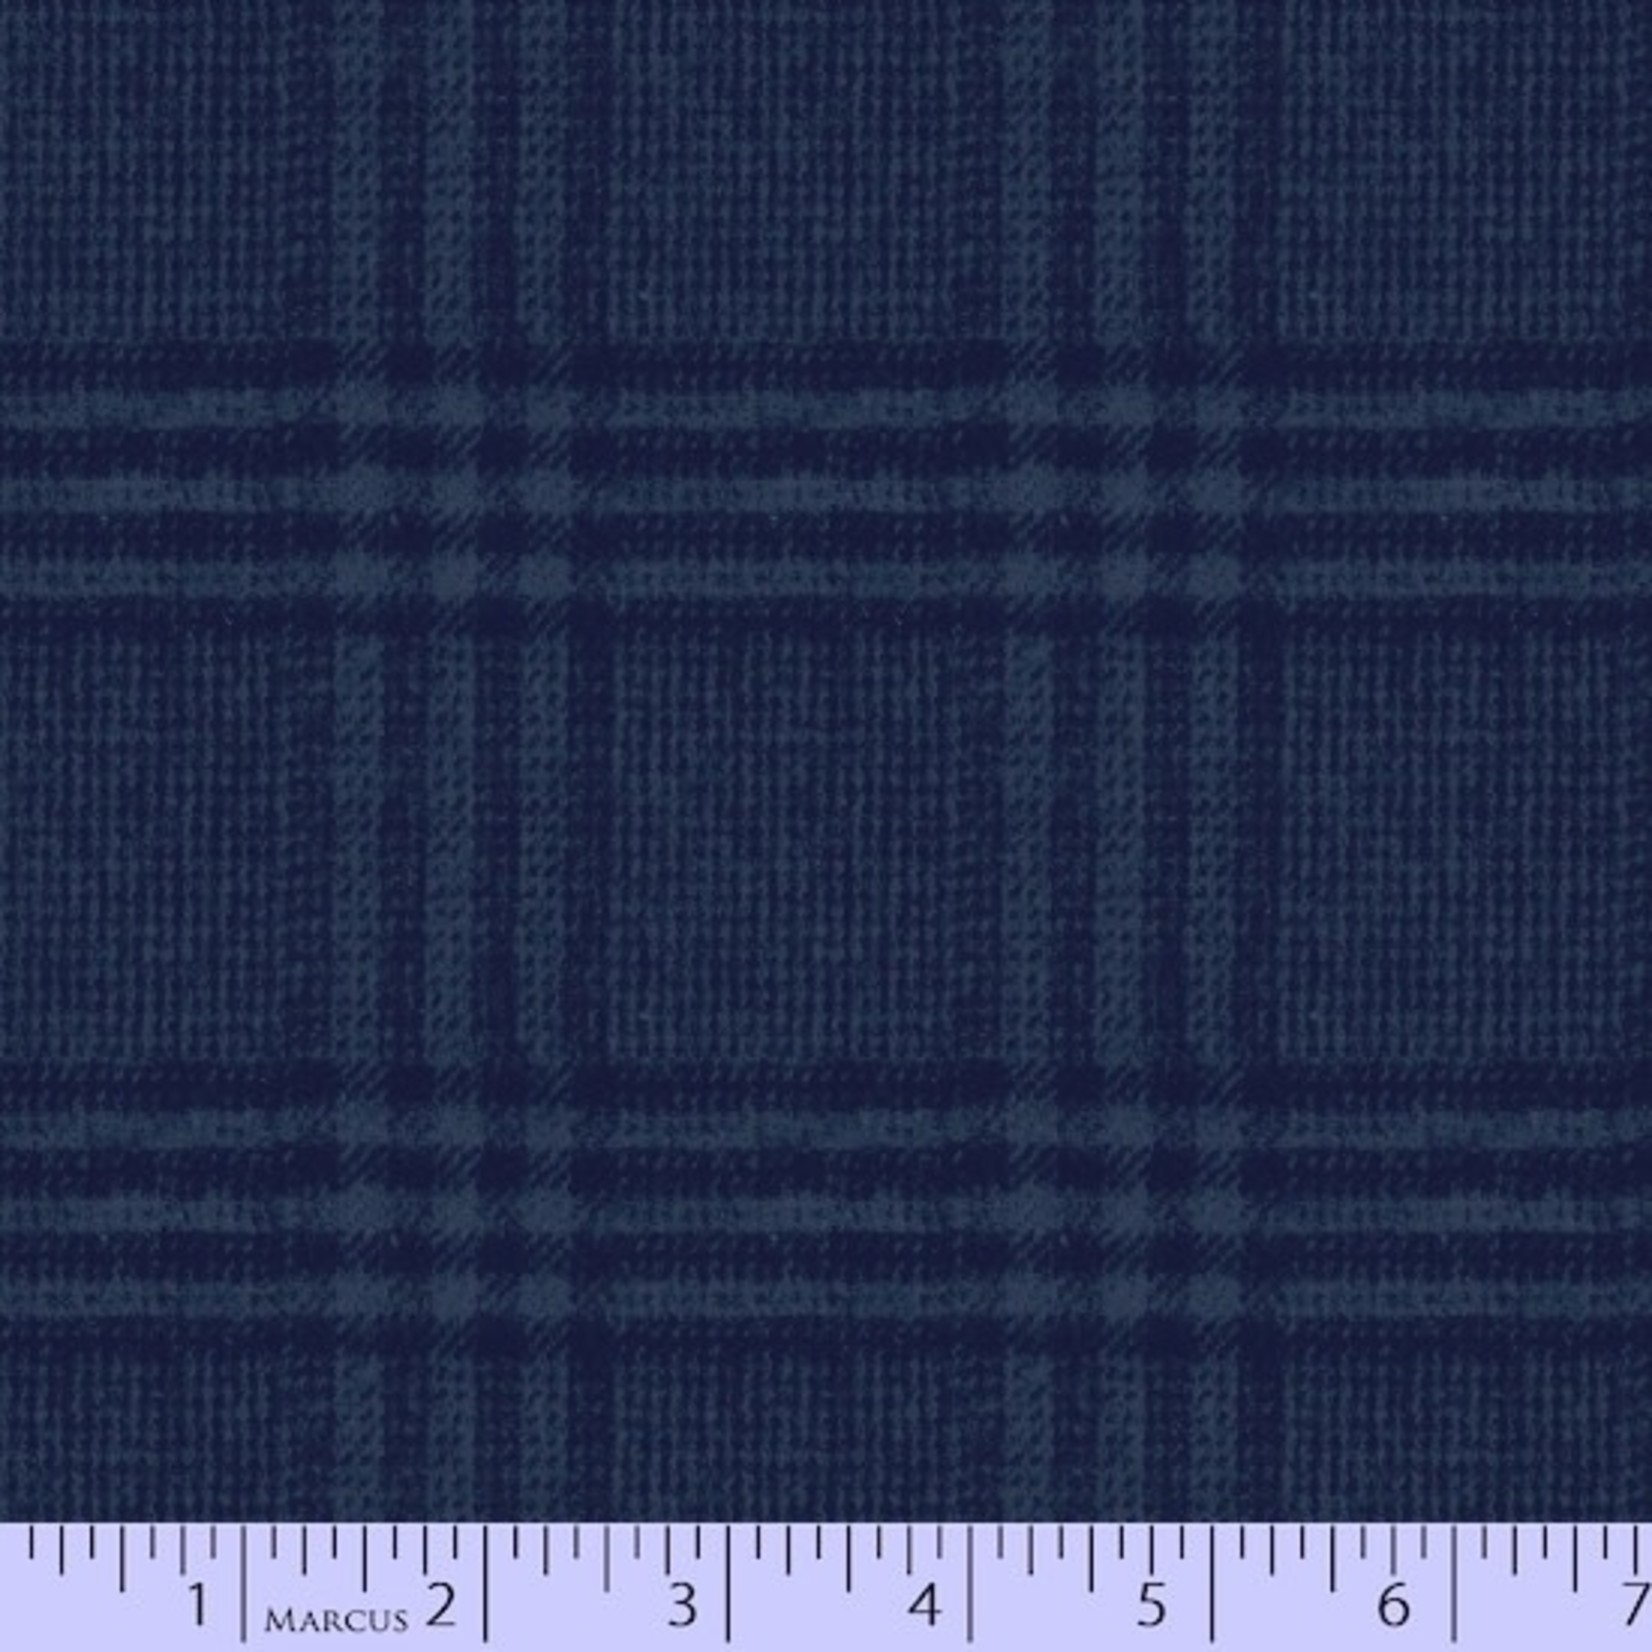 Marcus Fabrics Flannel Blues - Dark Blue